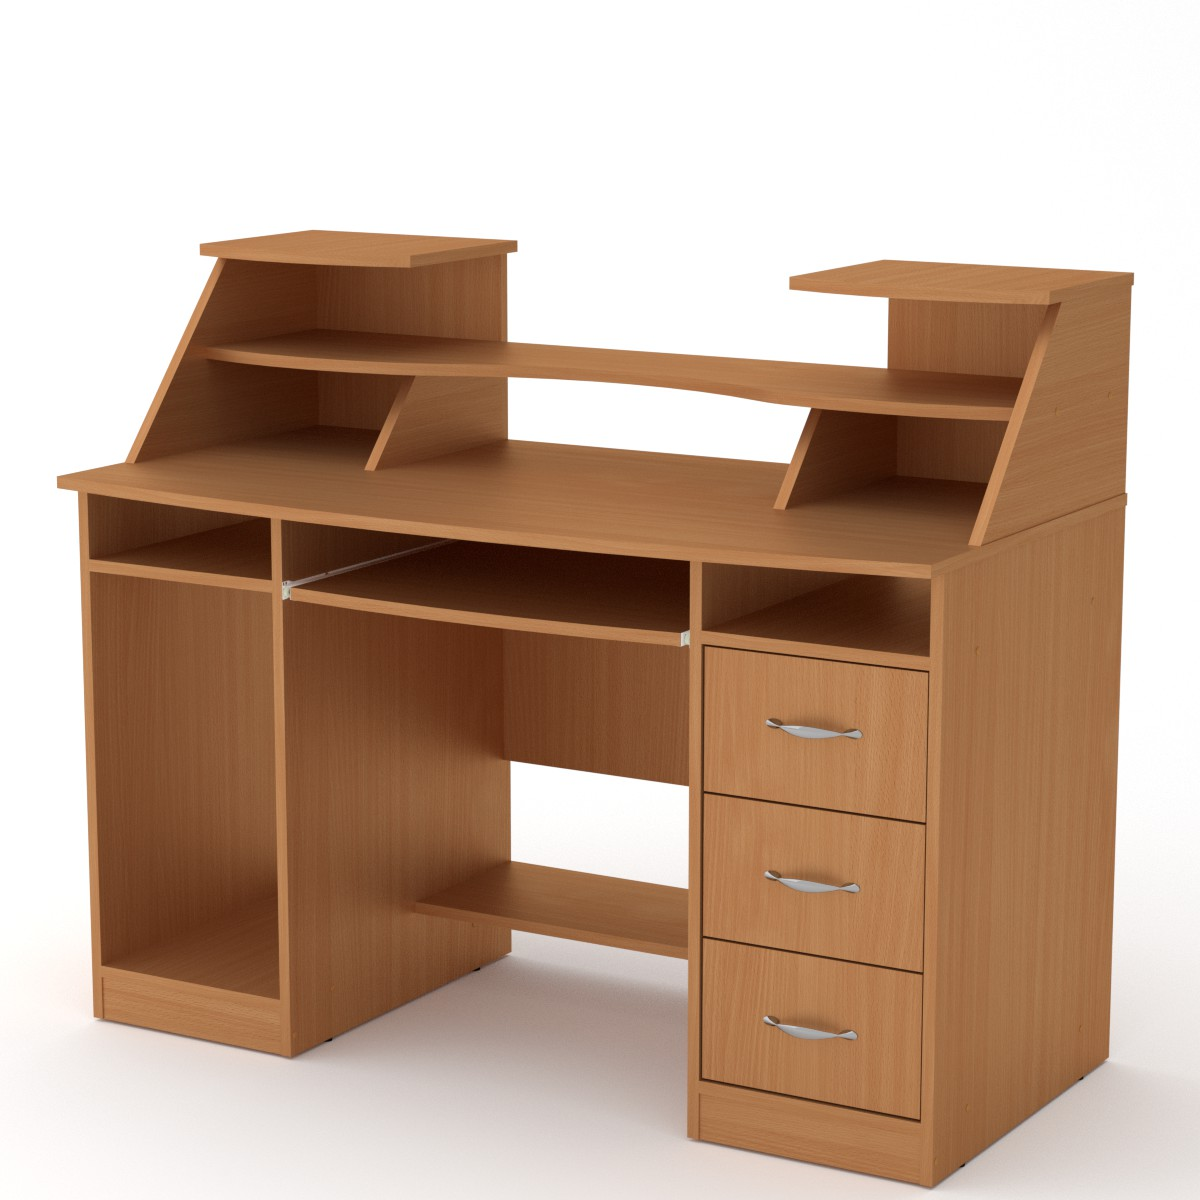 Стол компьютерный Комфорт-5, цвет бук